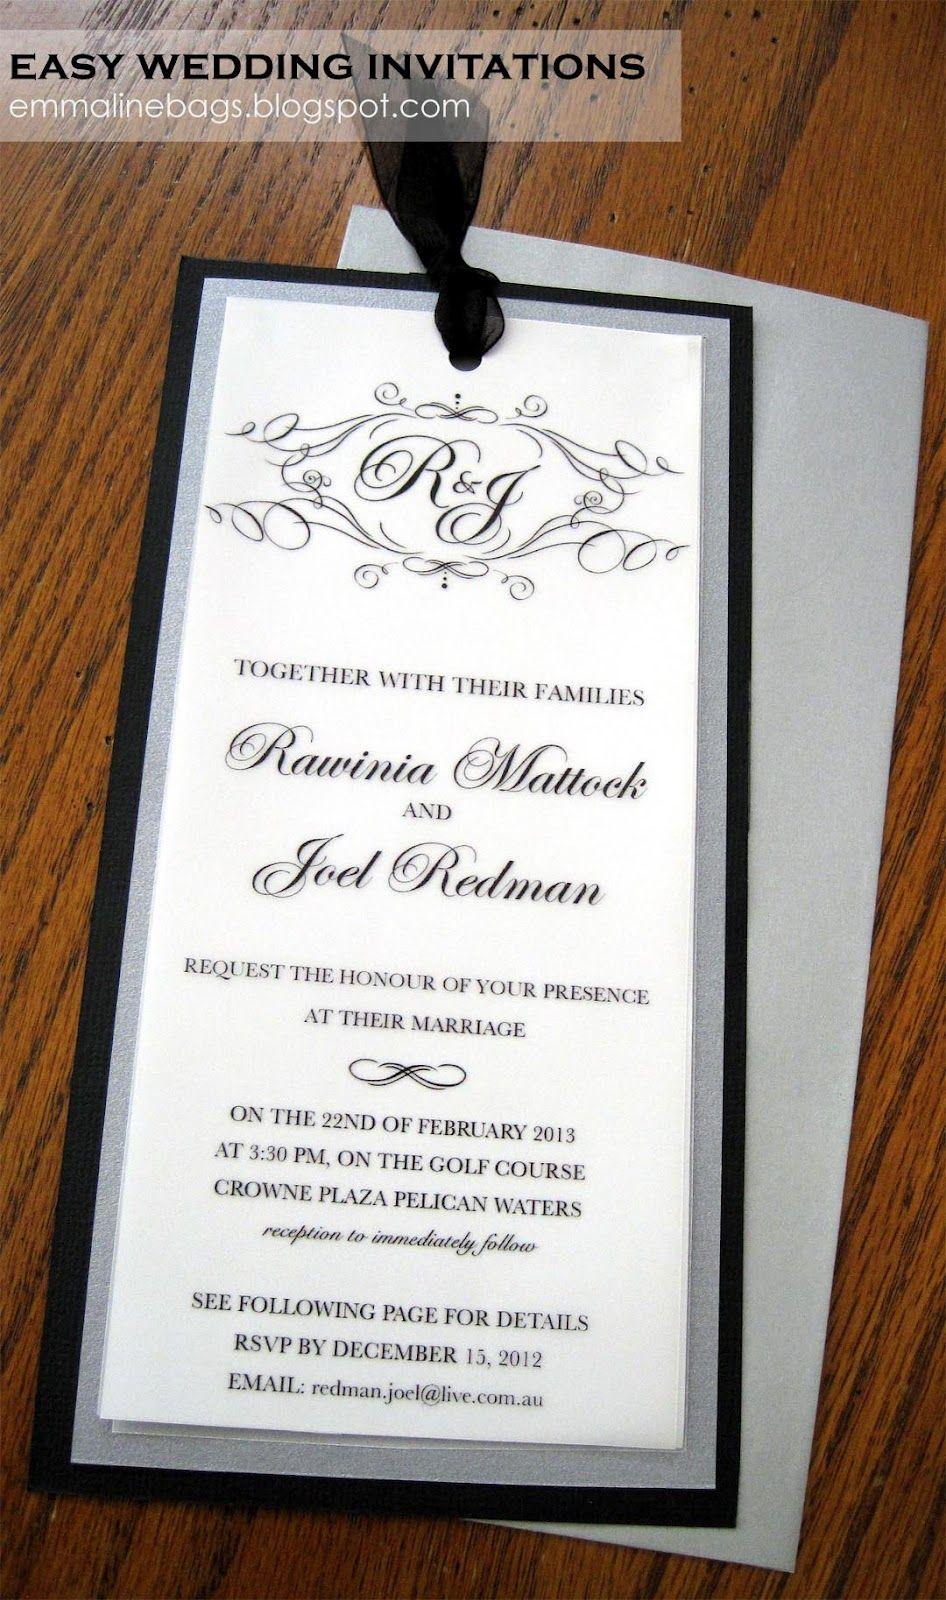 Emmaline bags u patterns diy wedding invitations i made this using